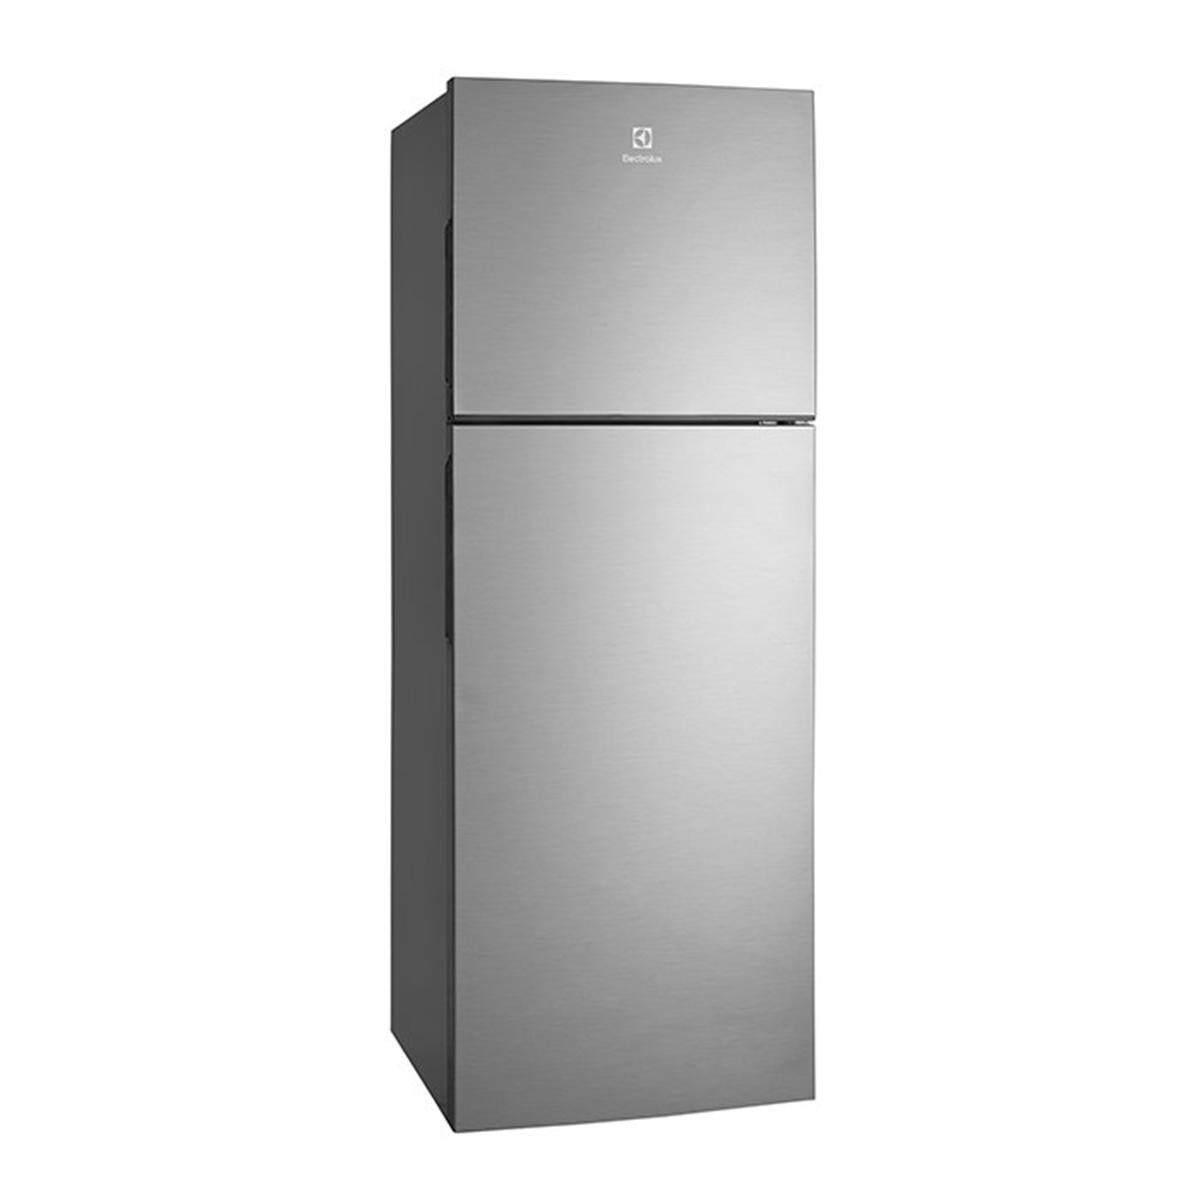 ELECTROLUX ตู้เย็น 2 ประตู 7.5 คิว รุ่น ETB 2102 MG